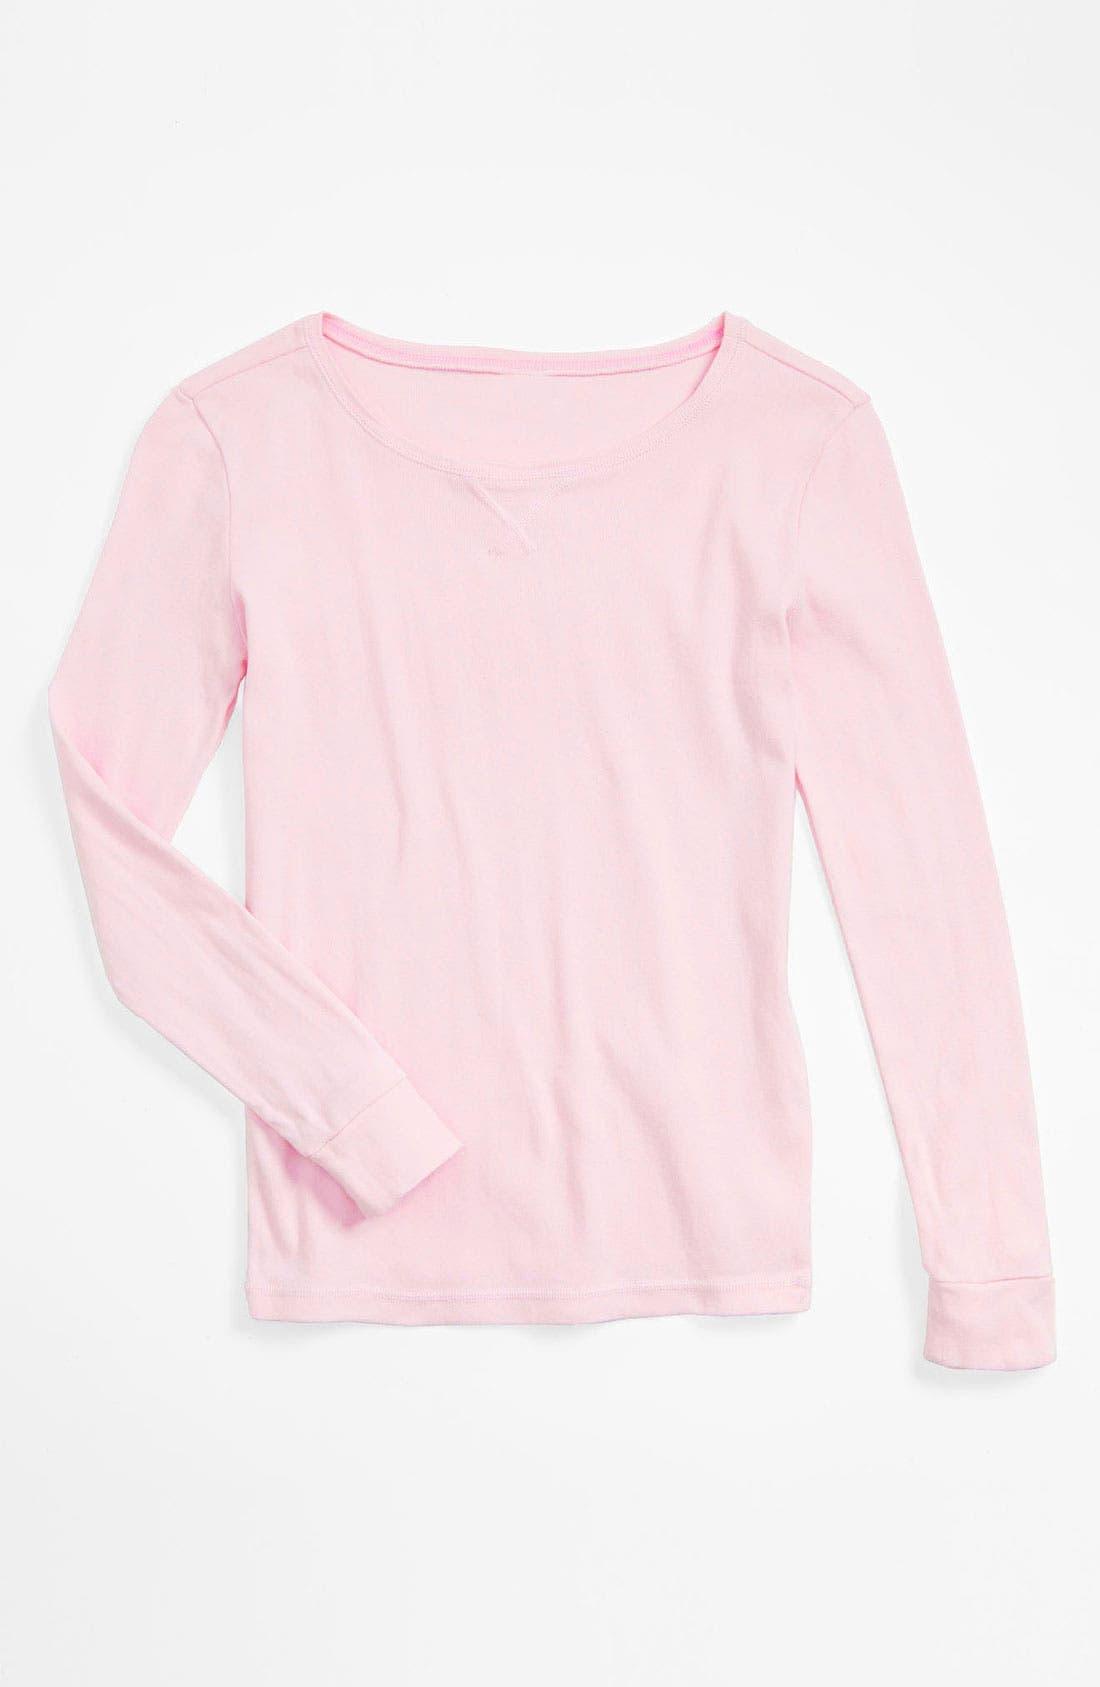 Alternate Image 1 Selected - Tucker + Tate Pajama Top (Little Girls & Big Girls)